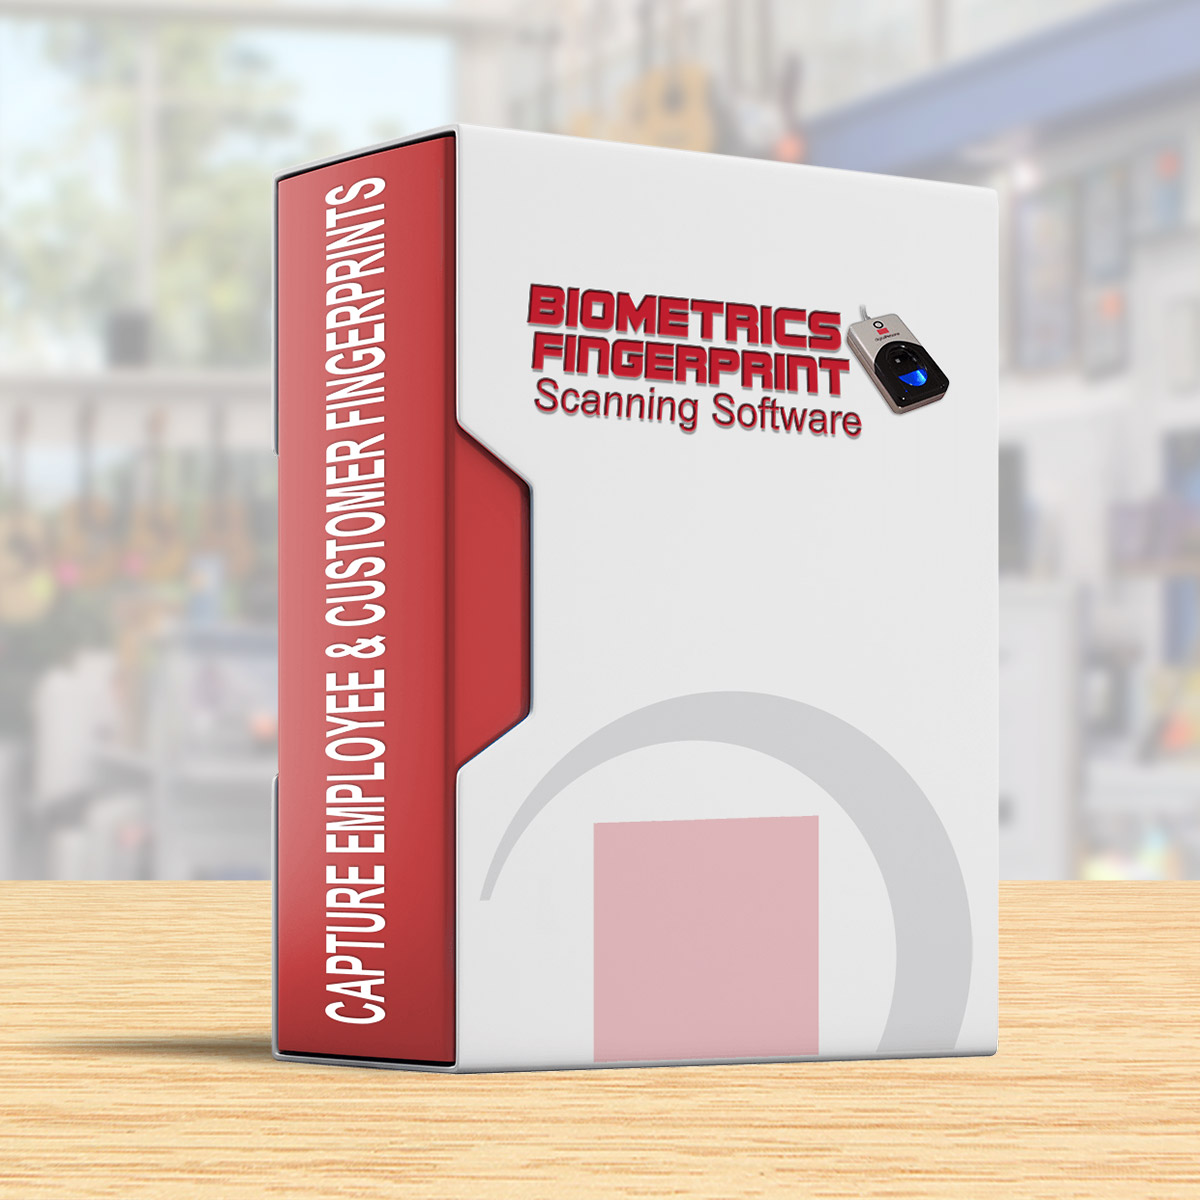 Biometrics Fingerprint Scanning Software   PawnMaster